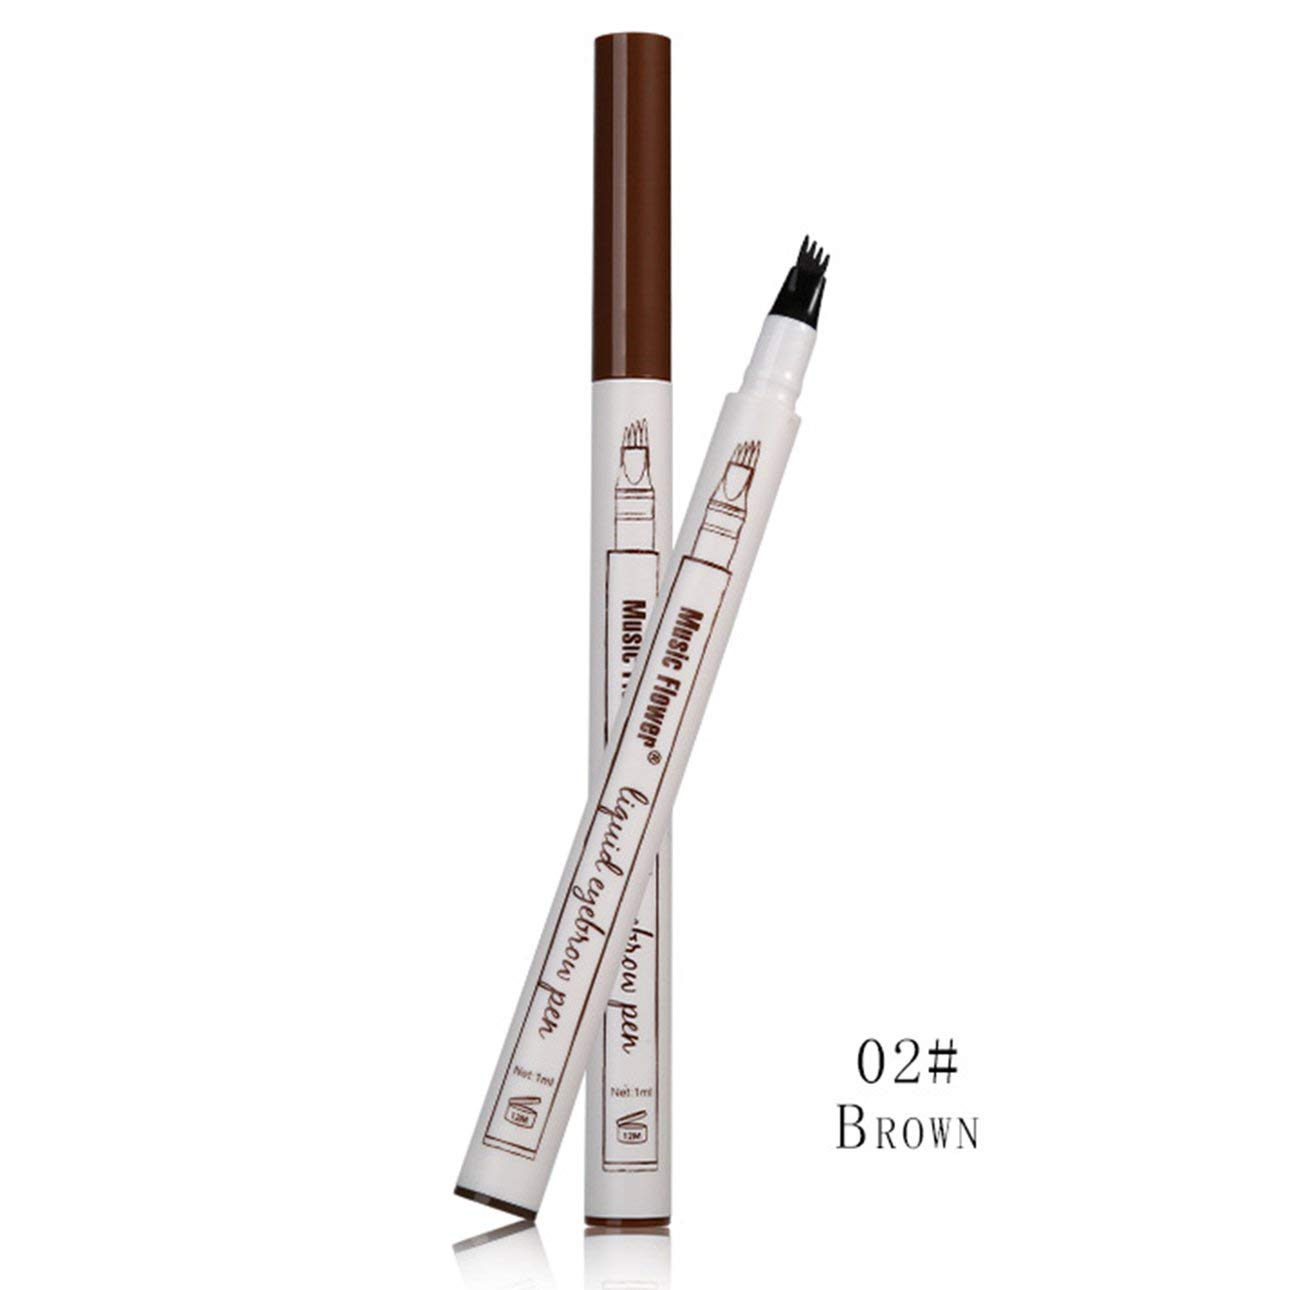 Liobaba Liquid Eyebrow Pen Waterproof Anti-sweat Tattooing Eye Brow Pencil Smudge-proof Long Lasting Eye Makeup